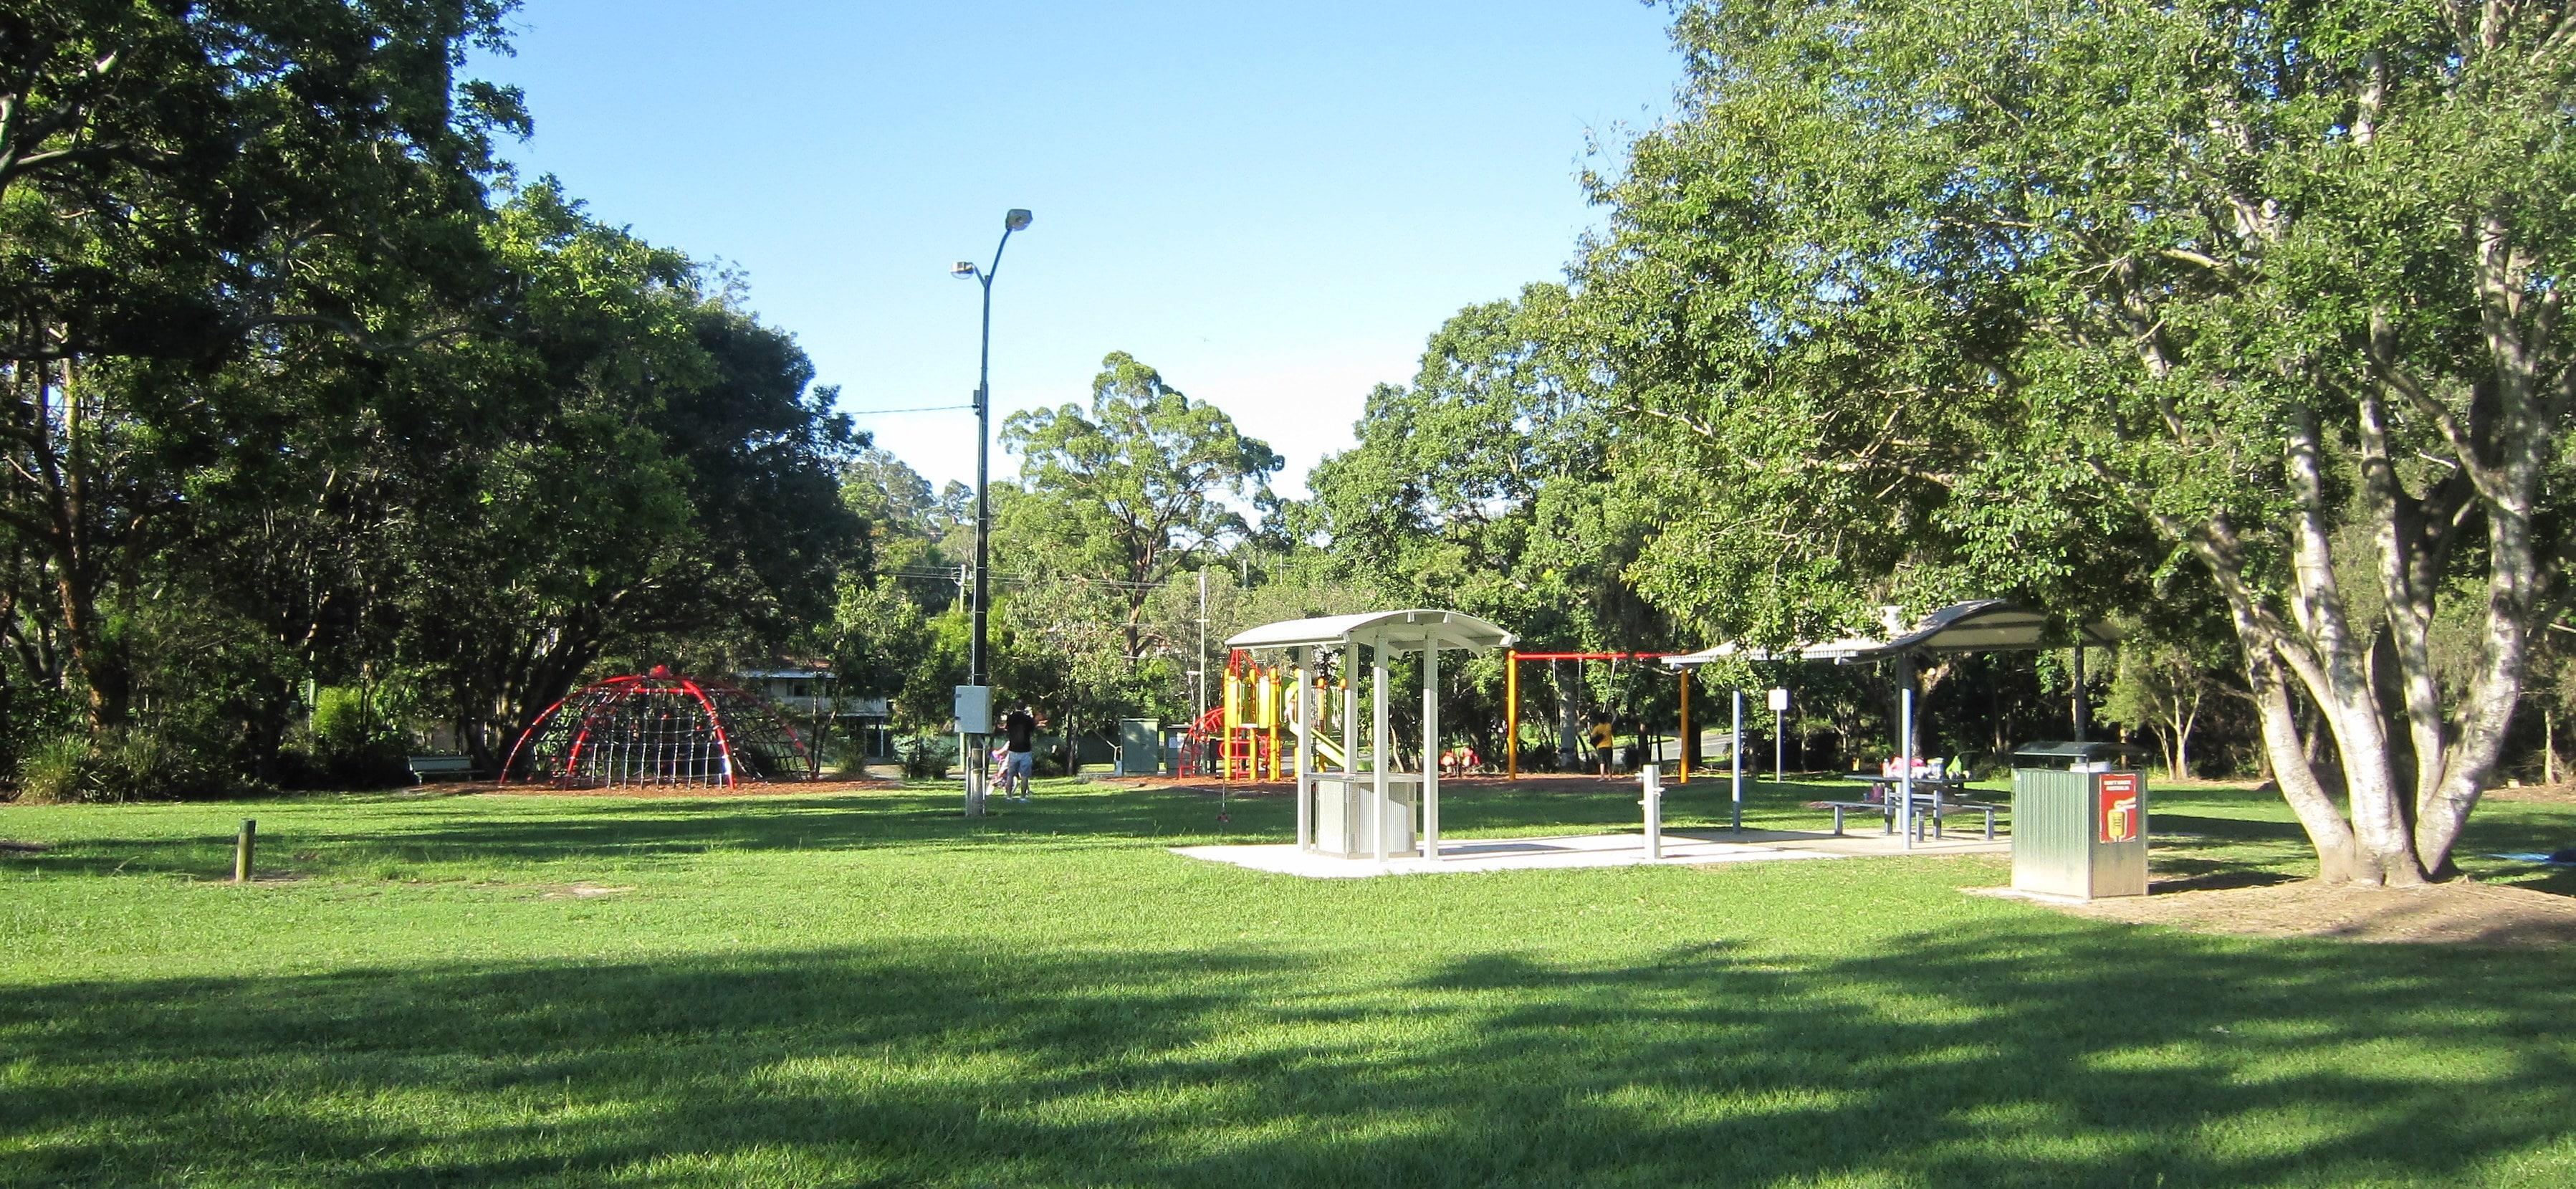 Boundary Park in Everton Hills